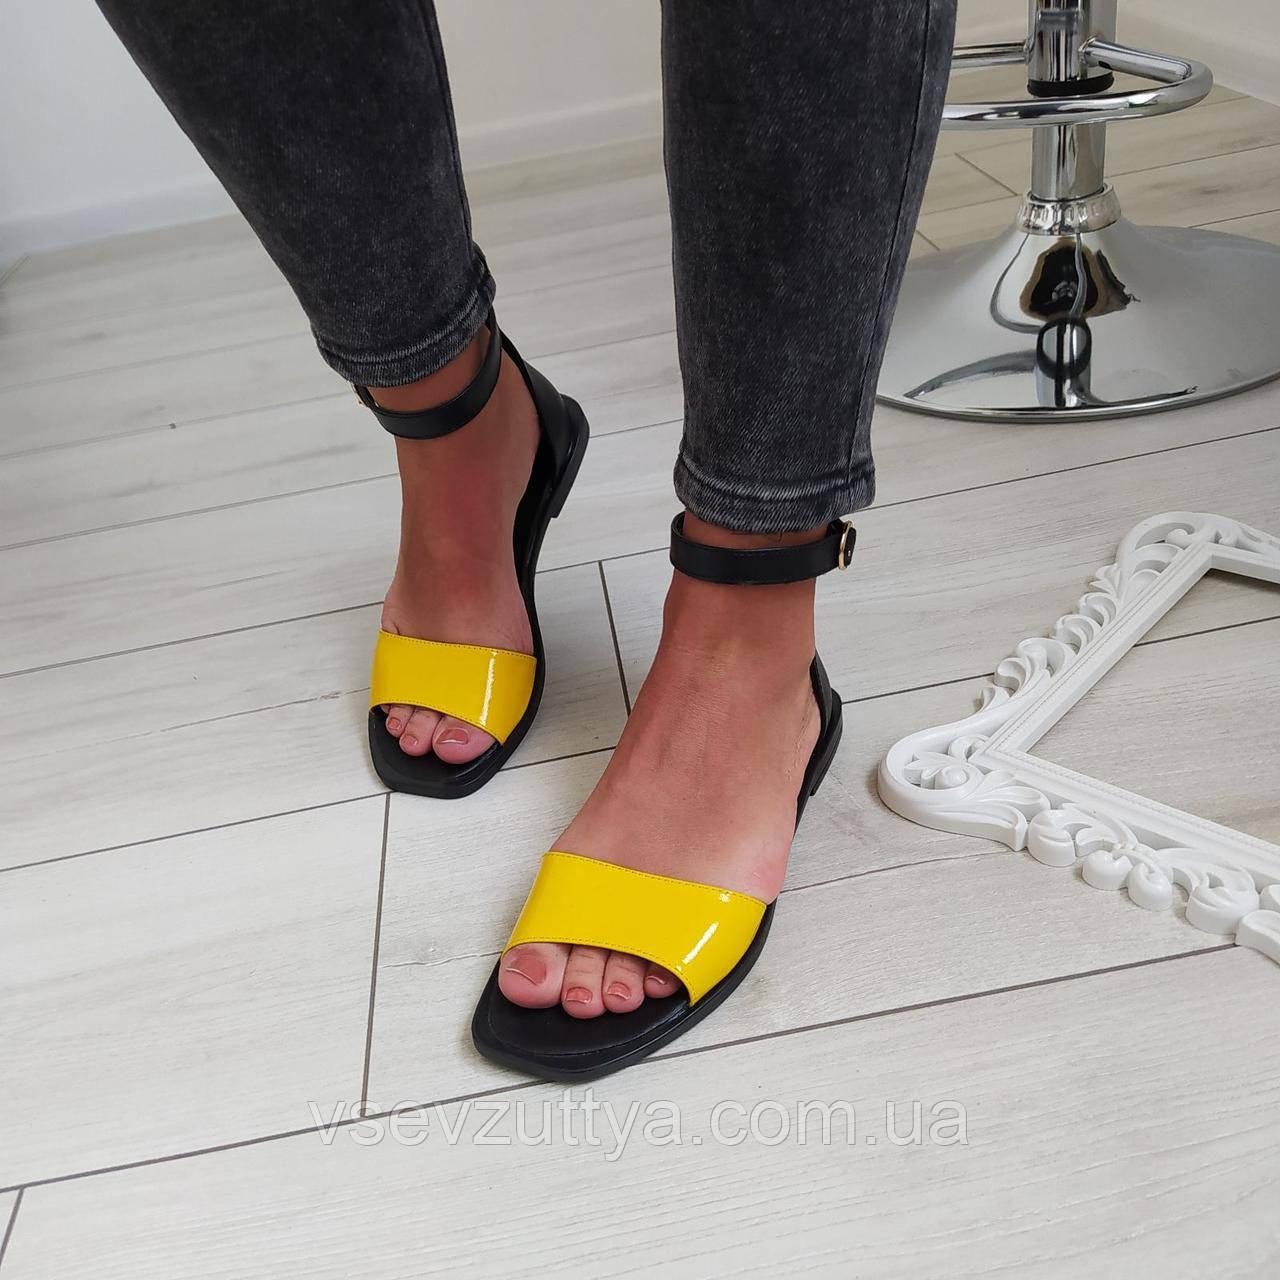 Босоніжки жіночі натуральна шкіра лак жовті